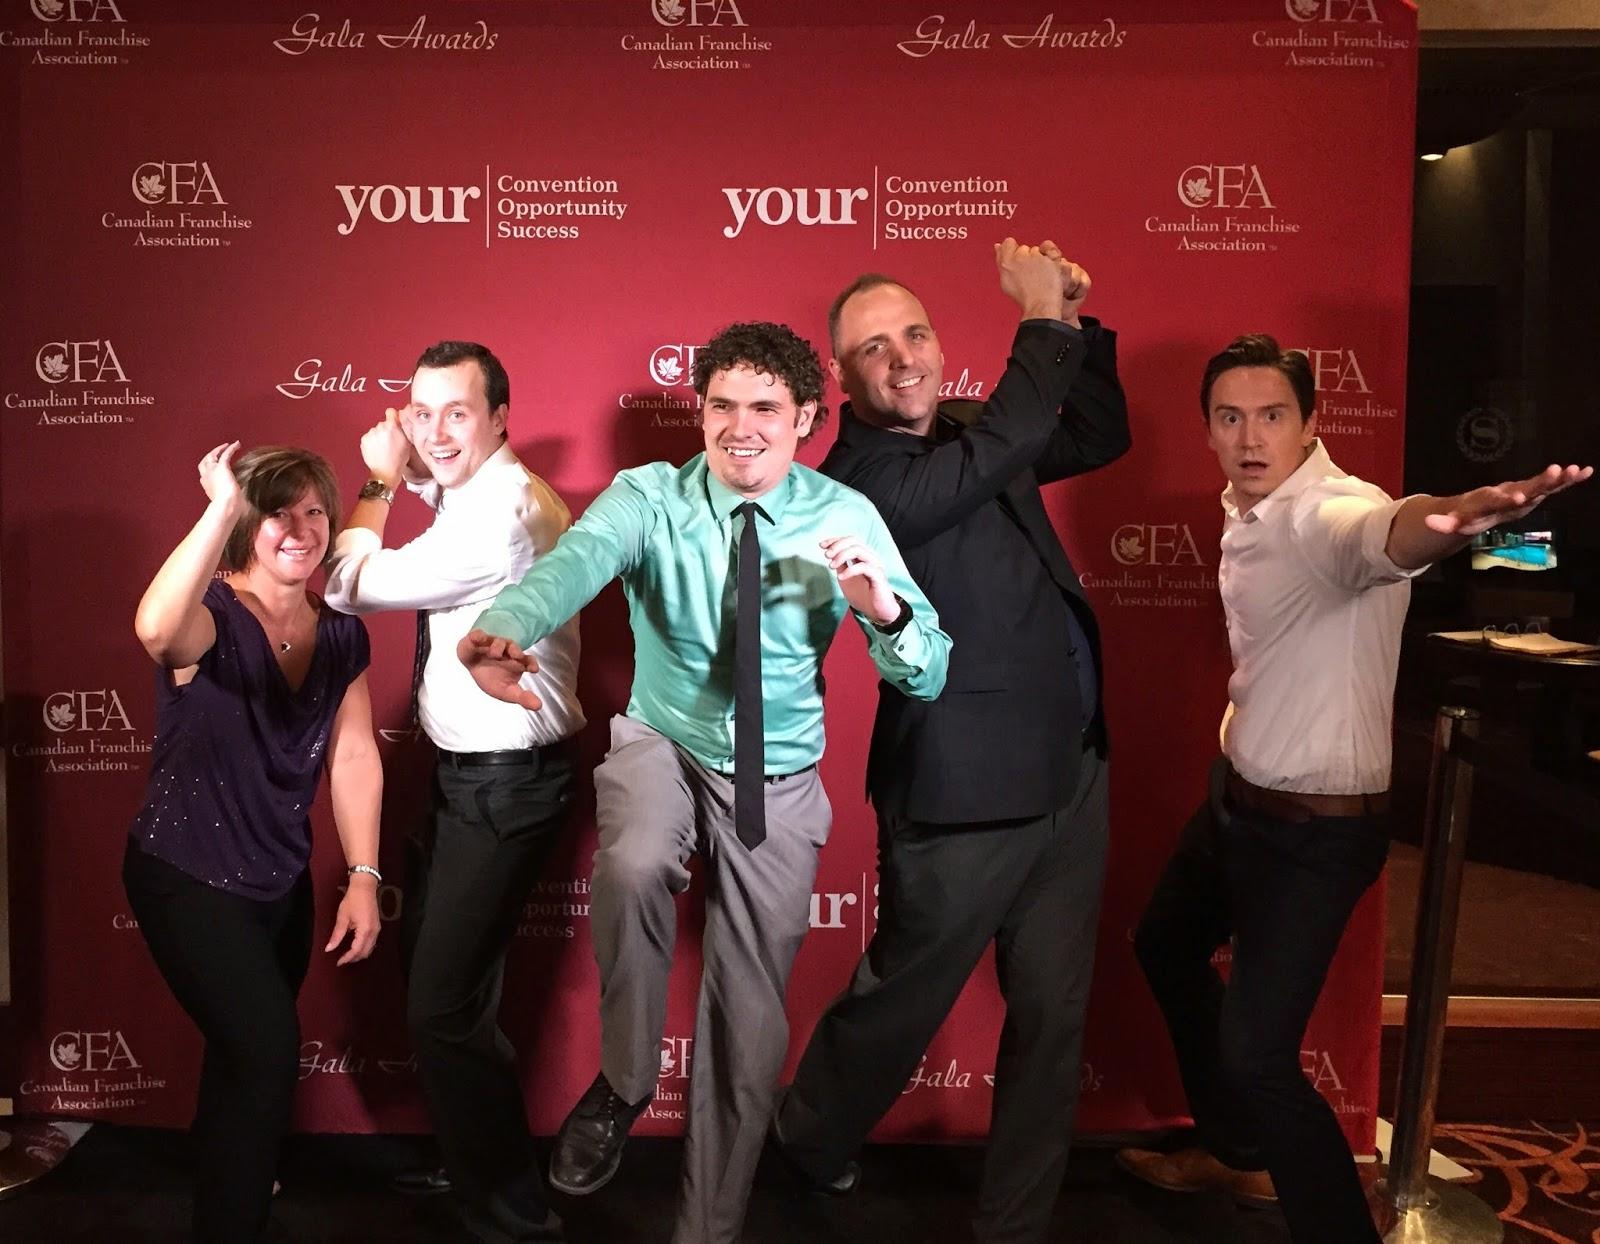 The JUST JUNK® Team: Andrea Bone, Ben Ellens, Shane Wright, Mike Thorne, and Steve Adams